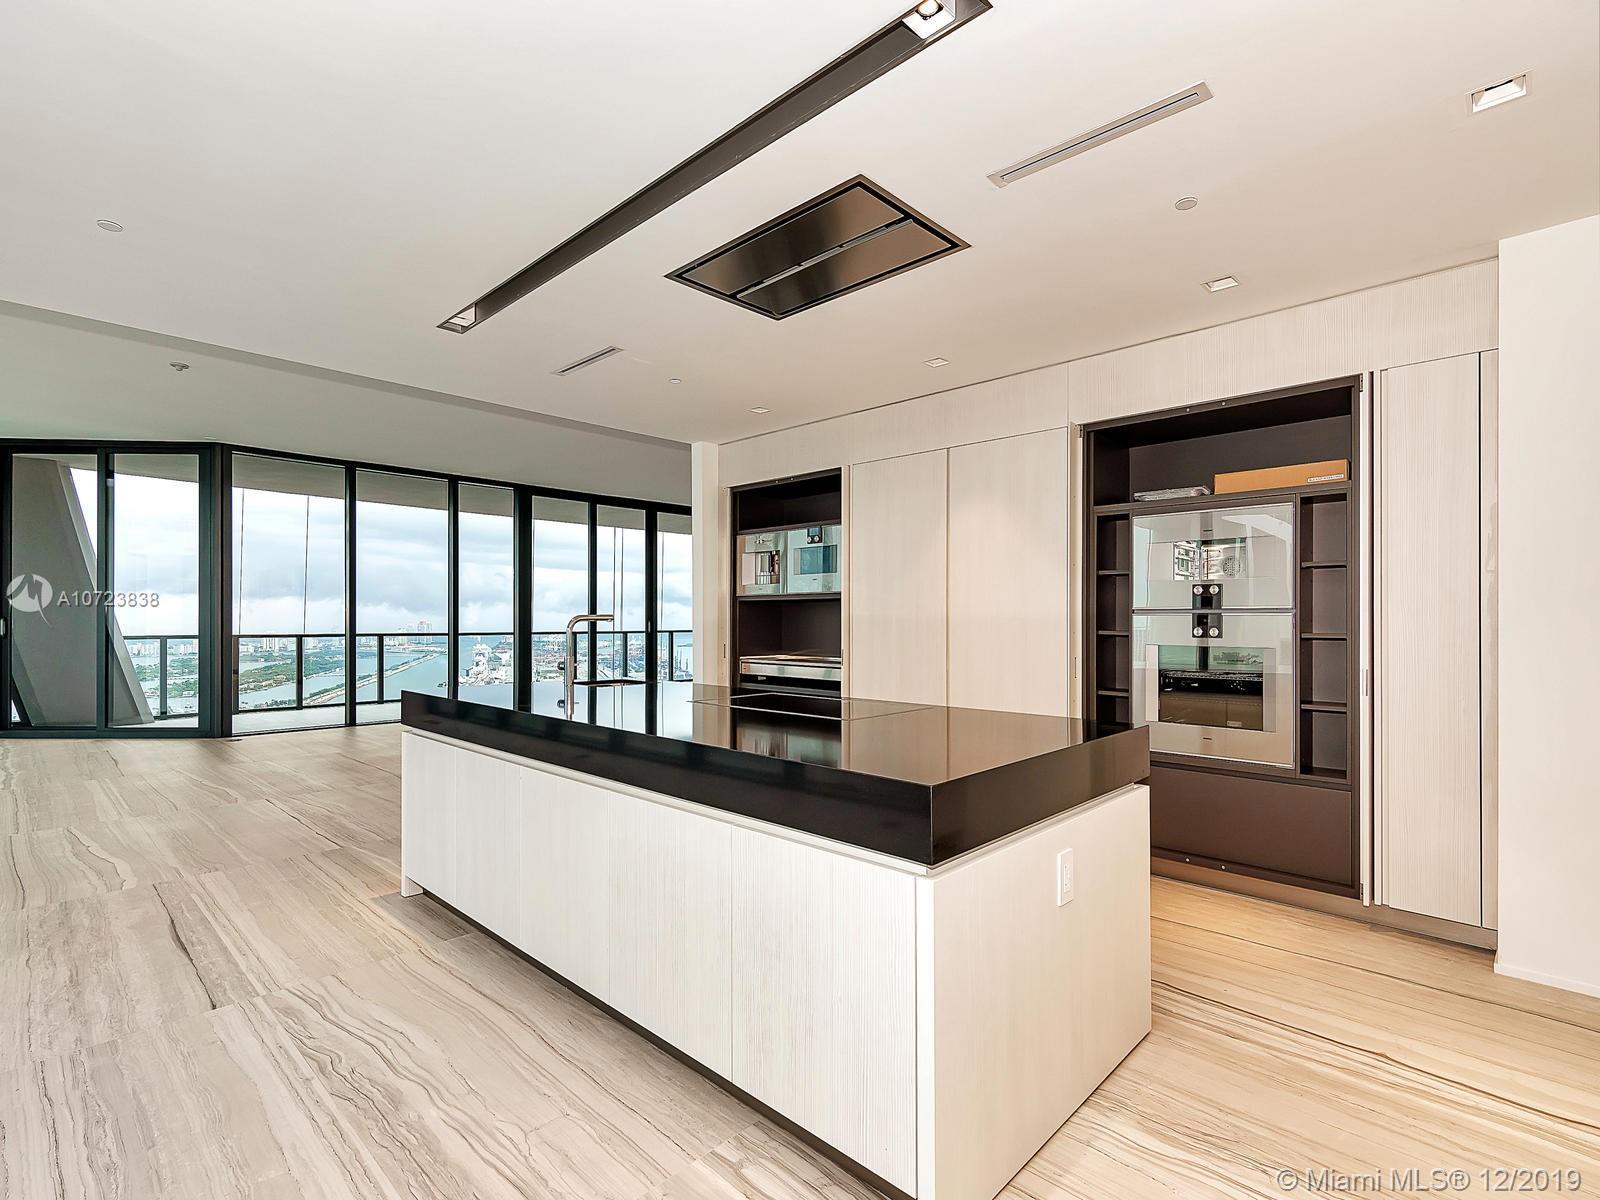 Аренда квартиры по адресу 1000 Biscayne Blvd, Miami, FL 33132 в США